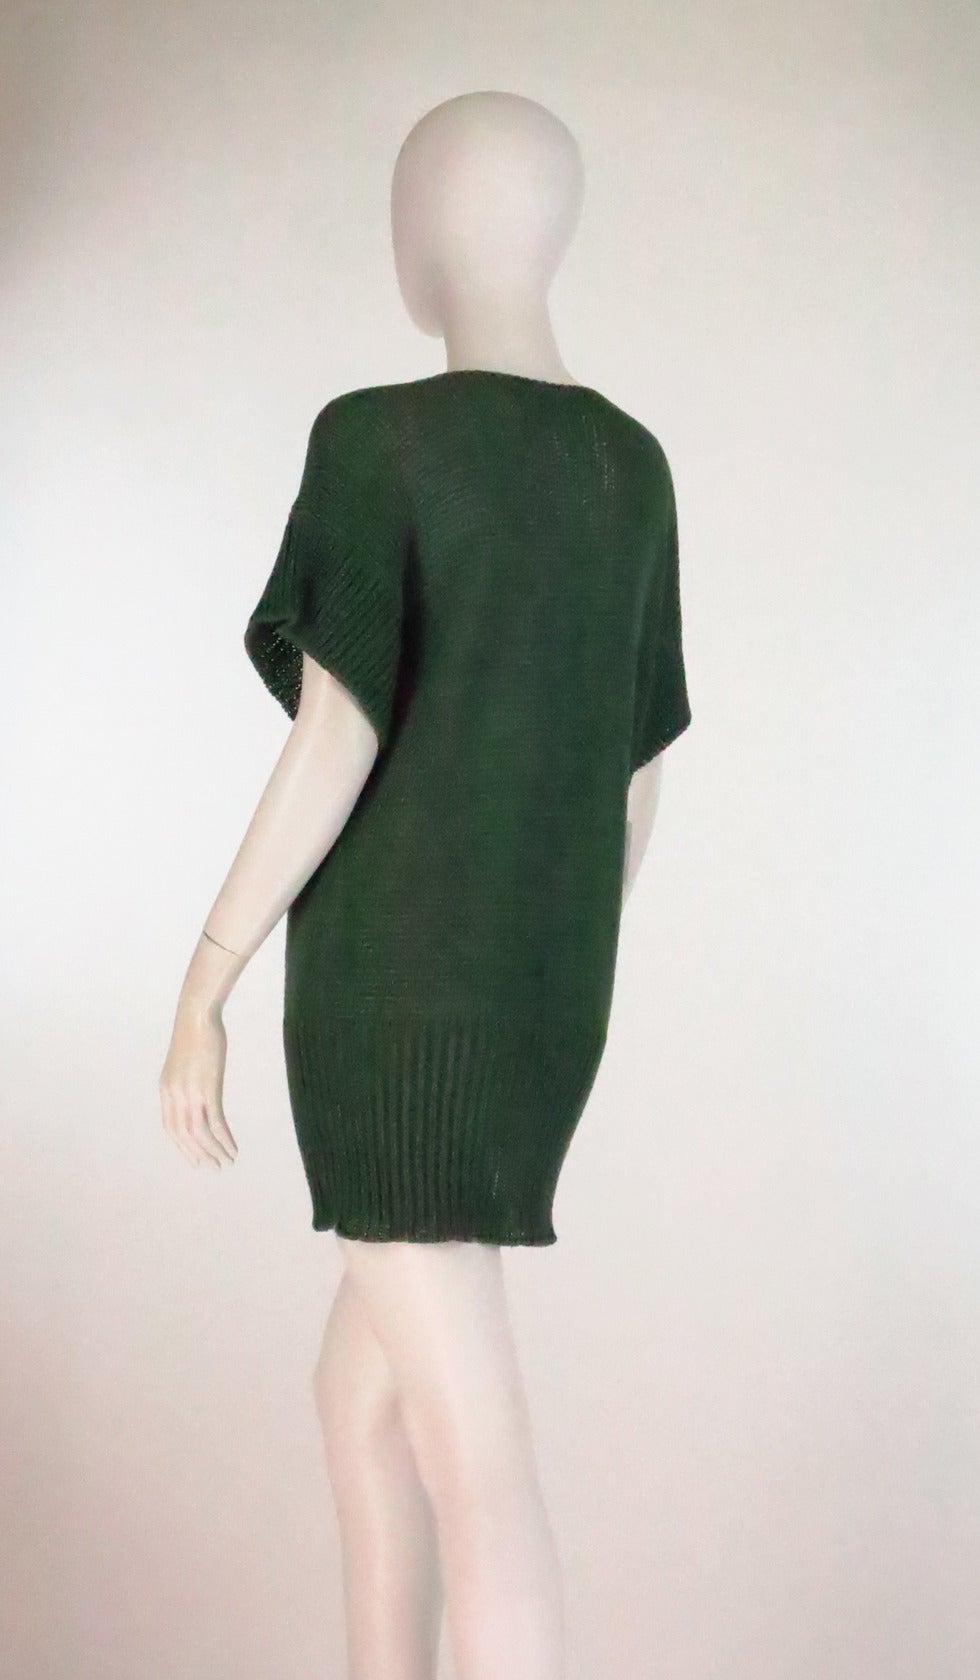 Black 1980s Jil Sander pine green sweater knit tunic For Sale